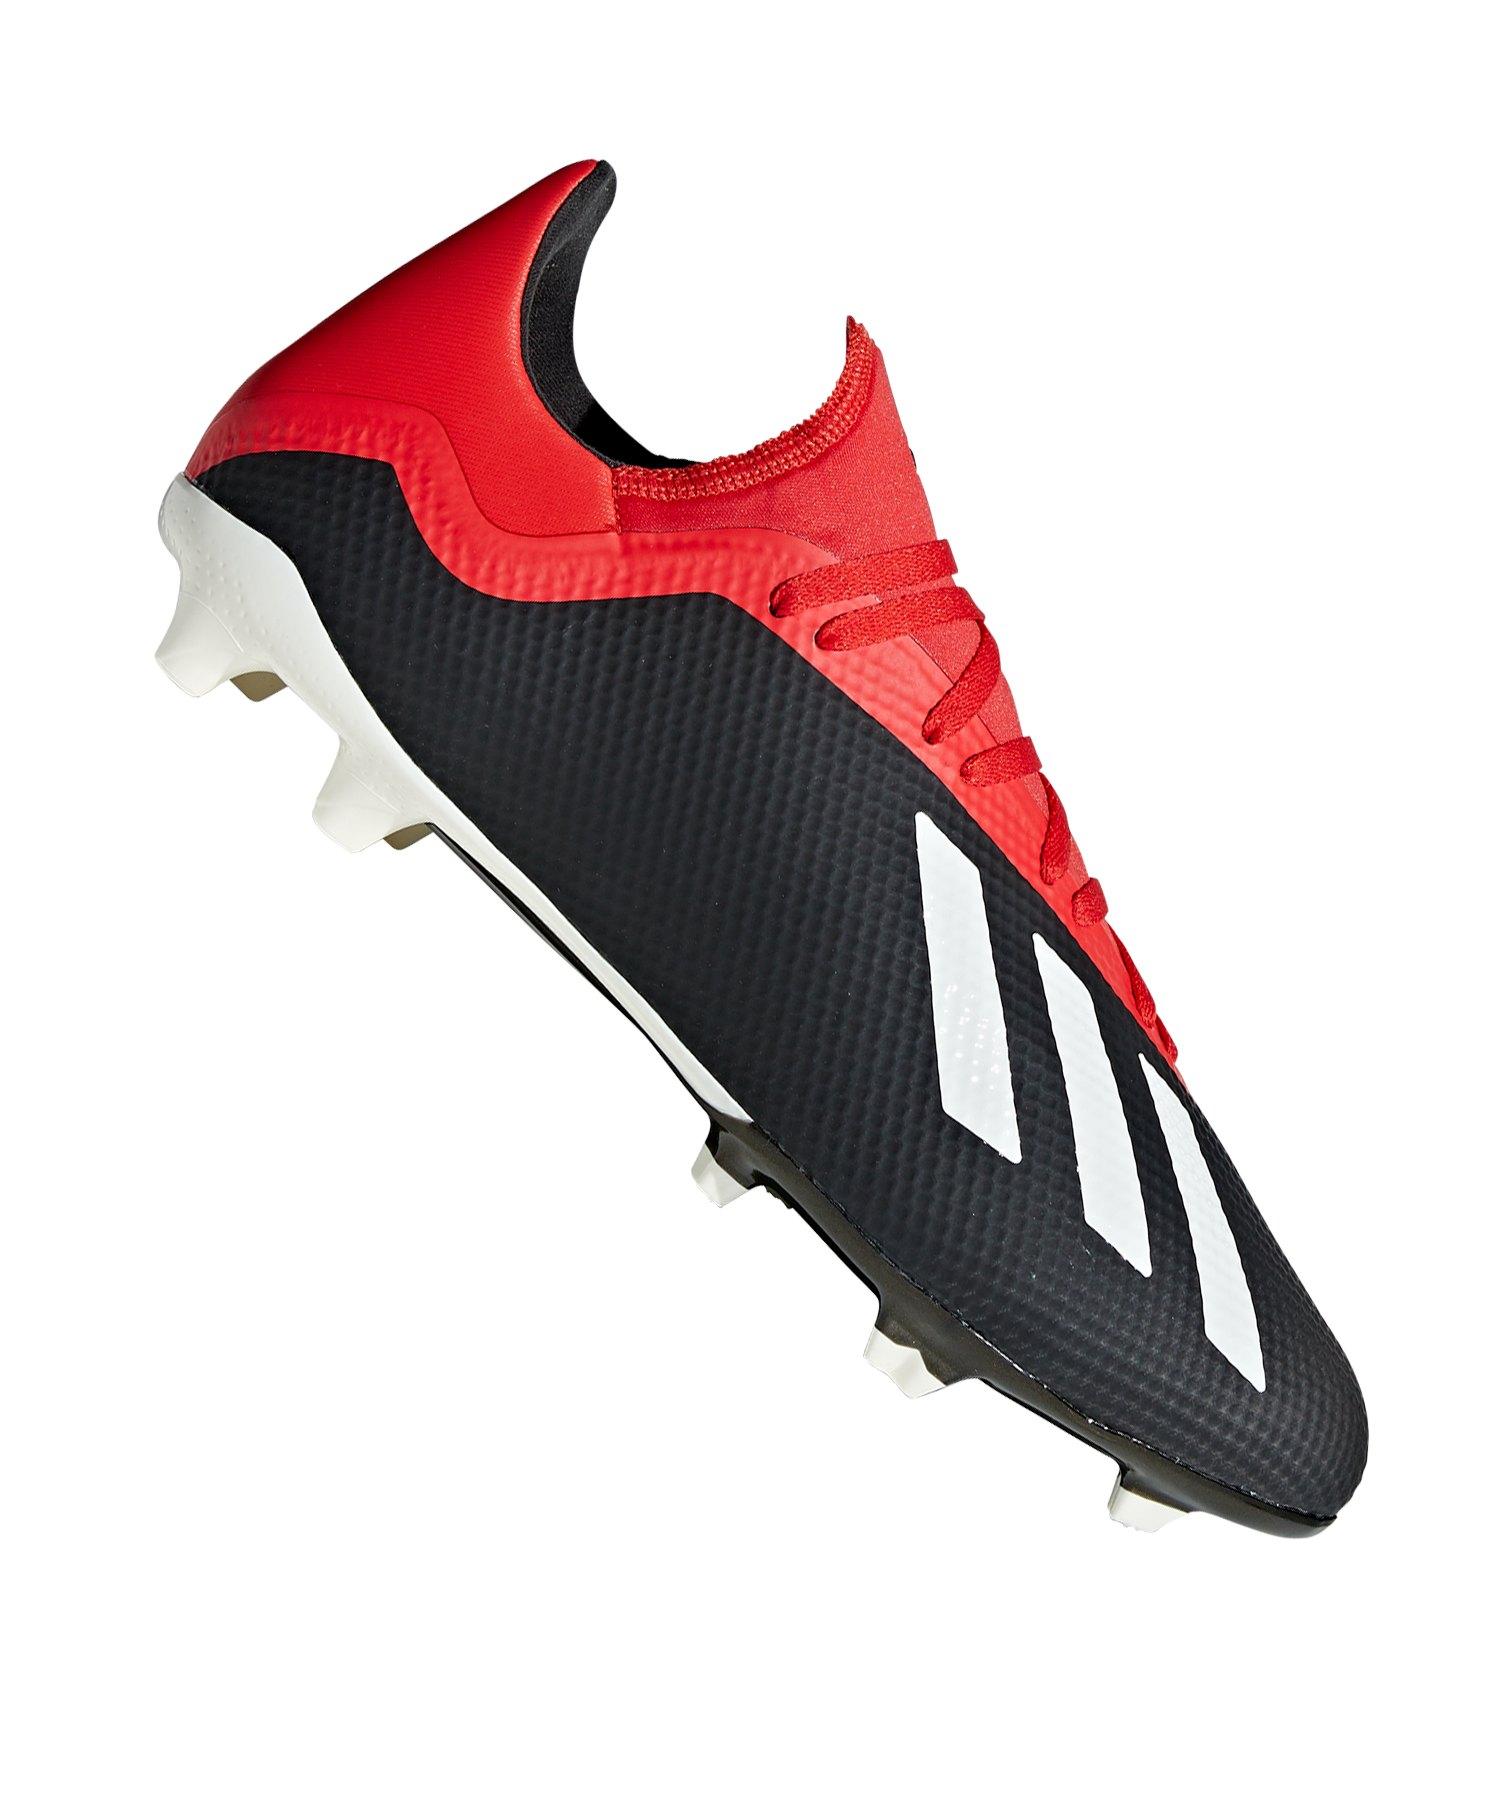 new product ea048 76e0e adidas X 18.3 FG Schwarz Rot - schwarz